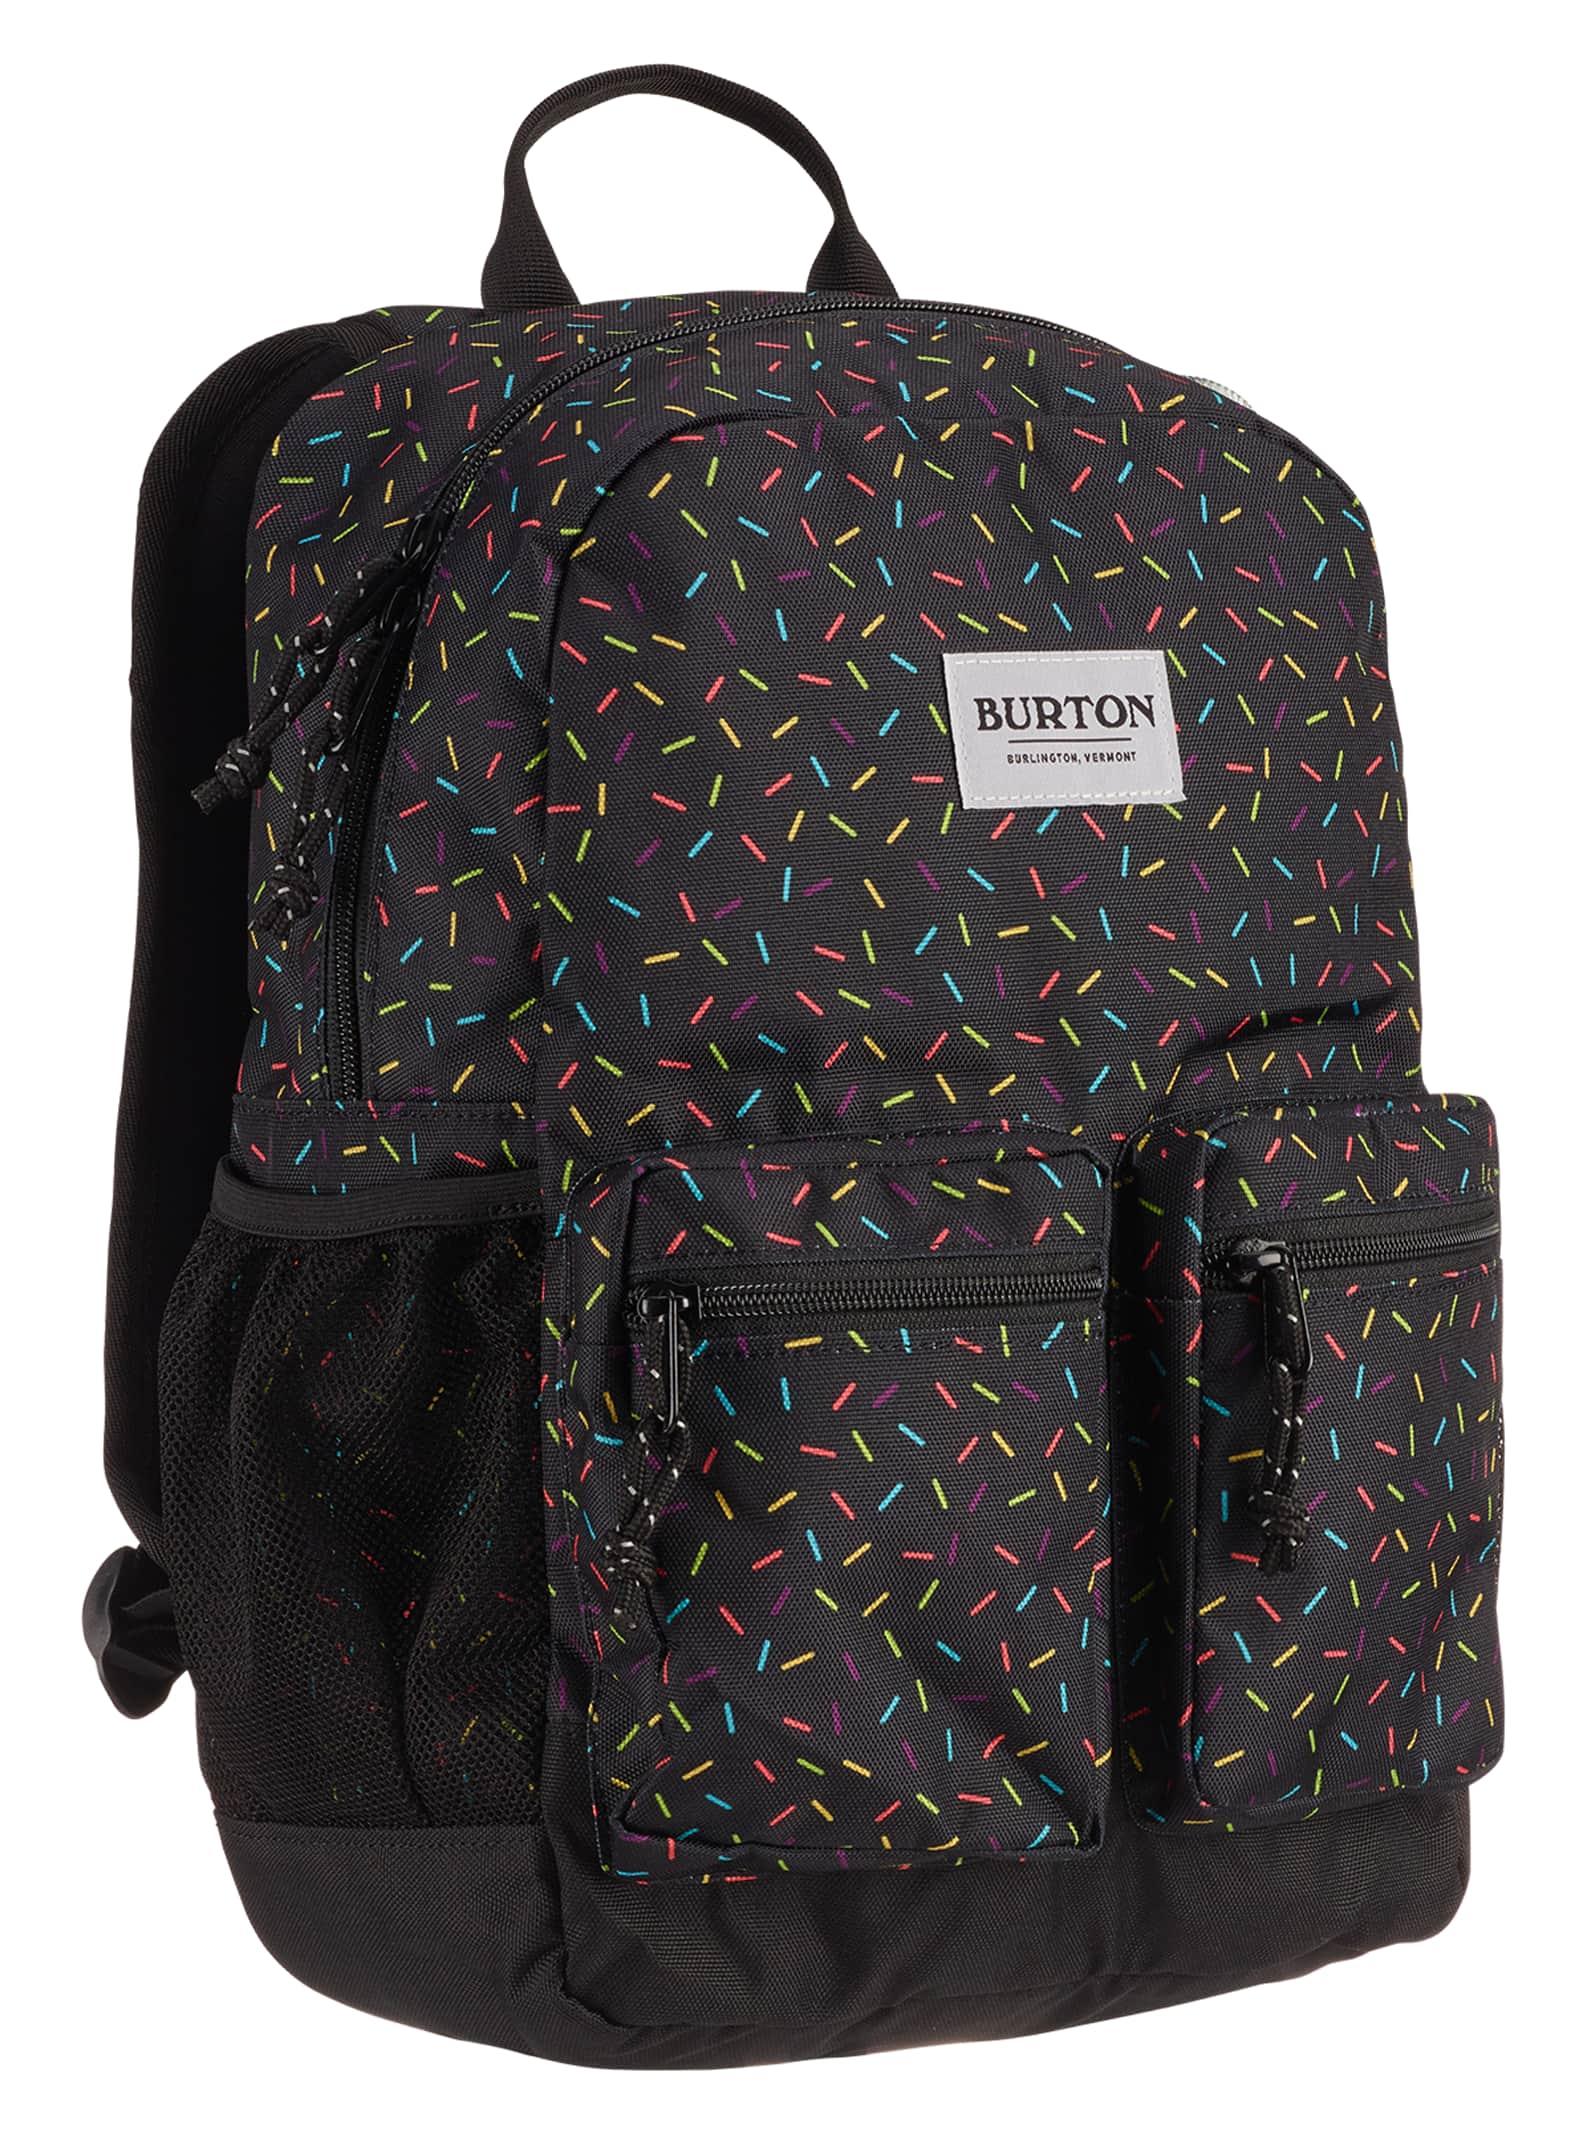 f54c0849fd0 Backpacks | Burton Snowboards